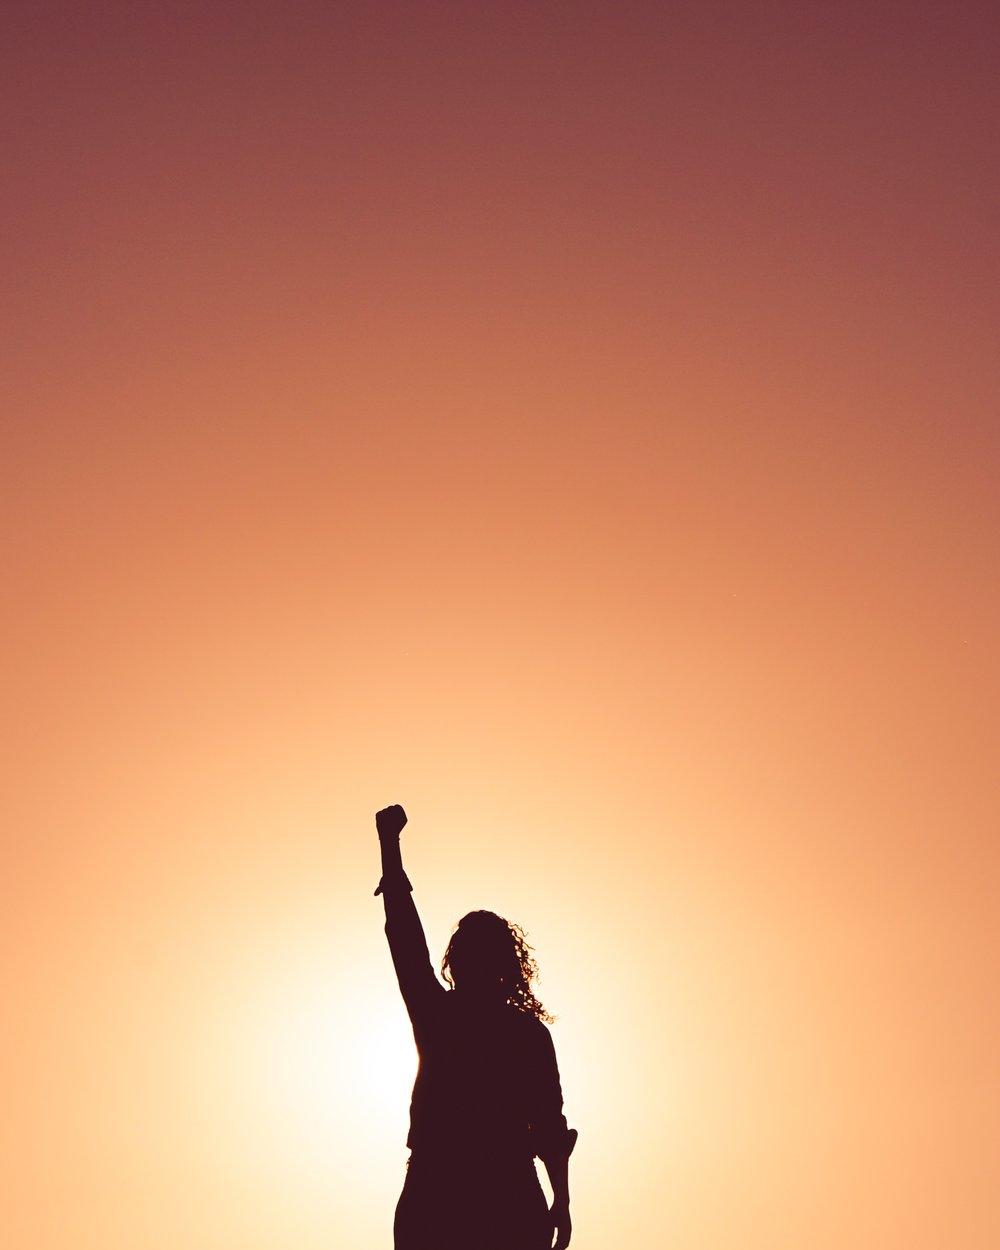 Unsplash_woman fist in air sun_miguel-bruna.jpg